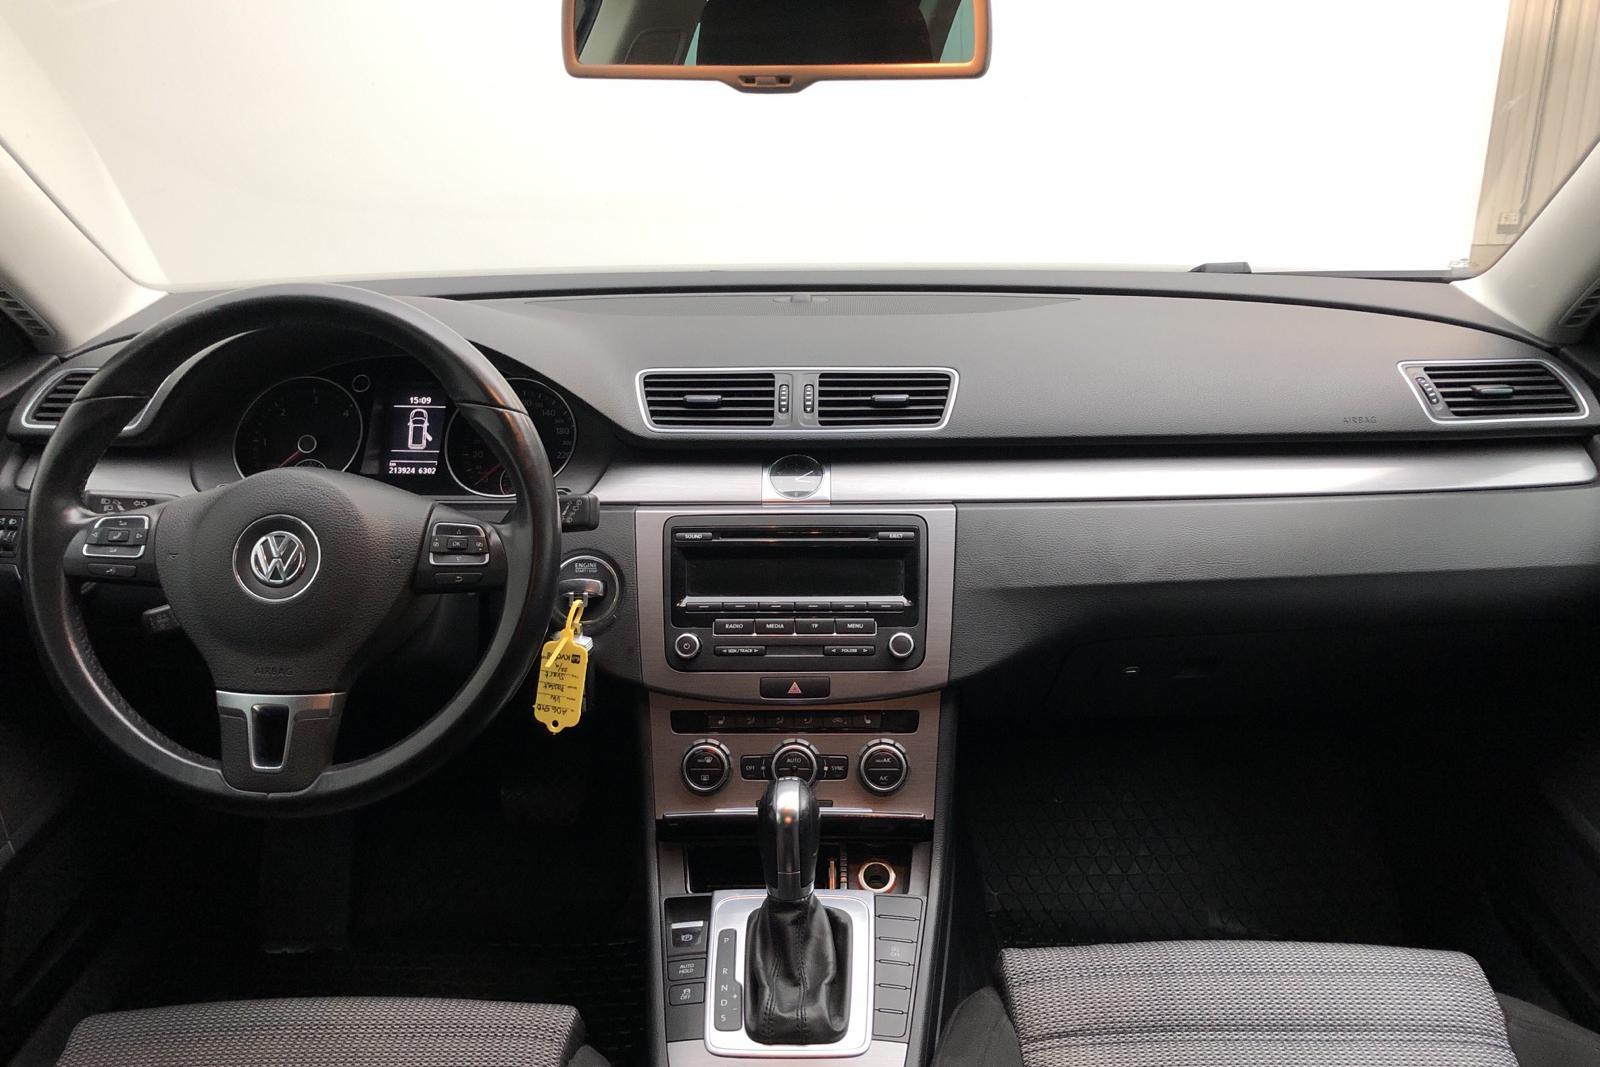 VW Passat 2.0 TDI BlueMotion Technology Variant (177hk) - 21 000 mil - Automat - svart - 2013